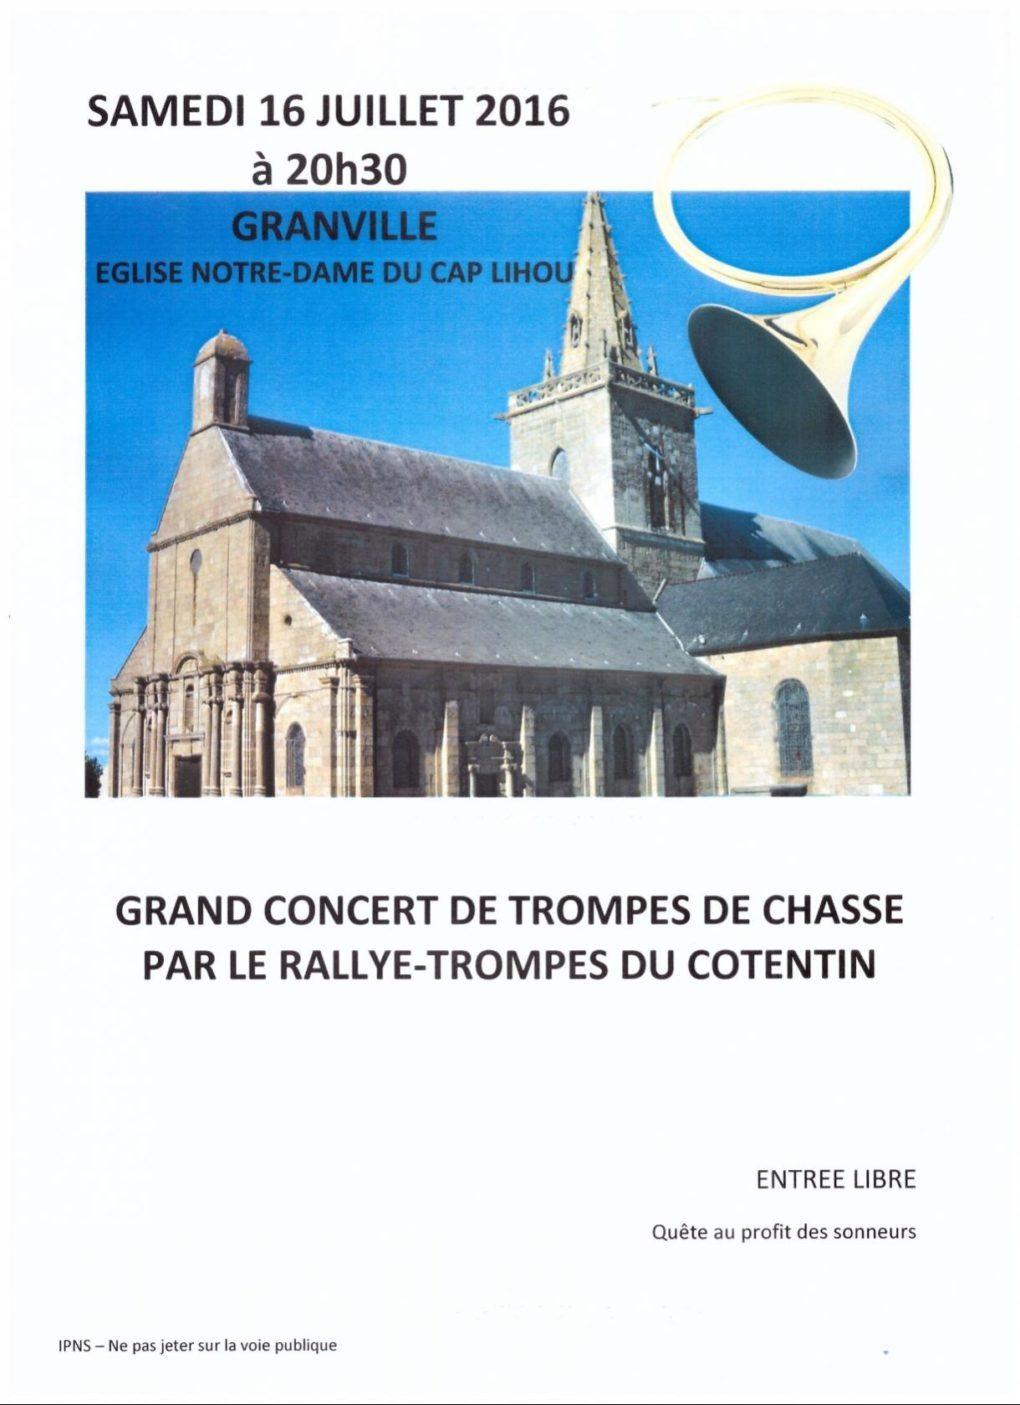 Rallye-trompes du Cotentin Granville